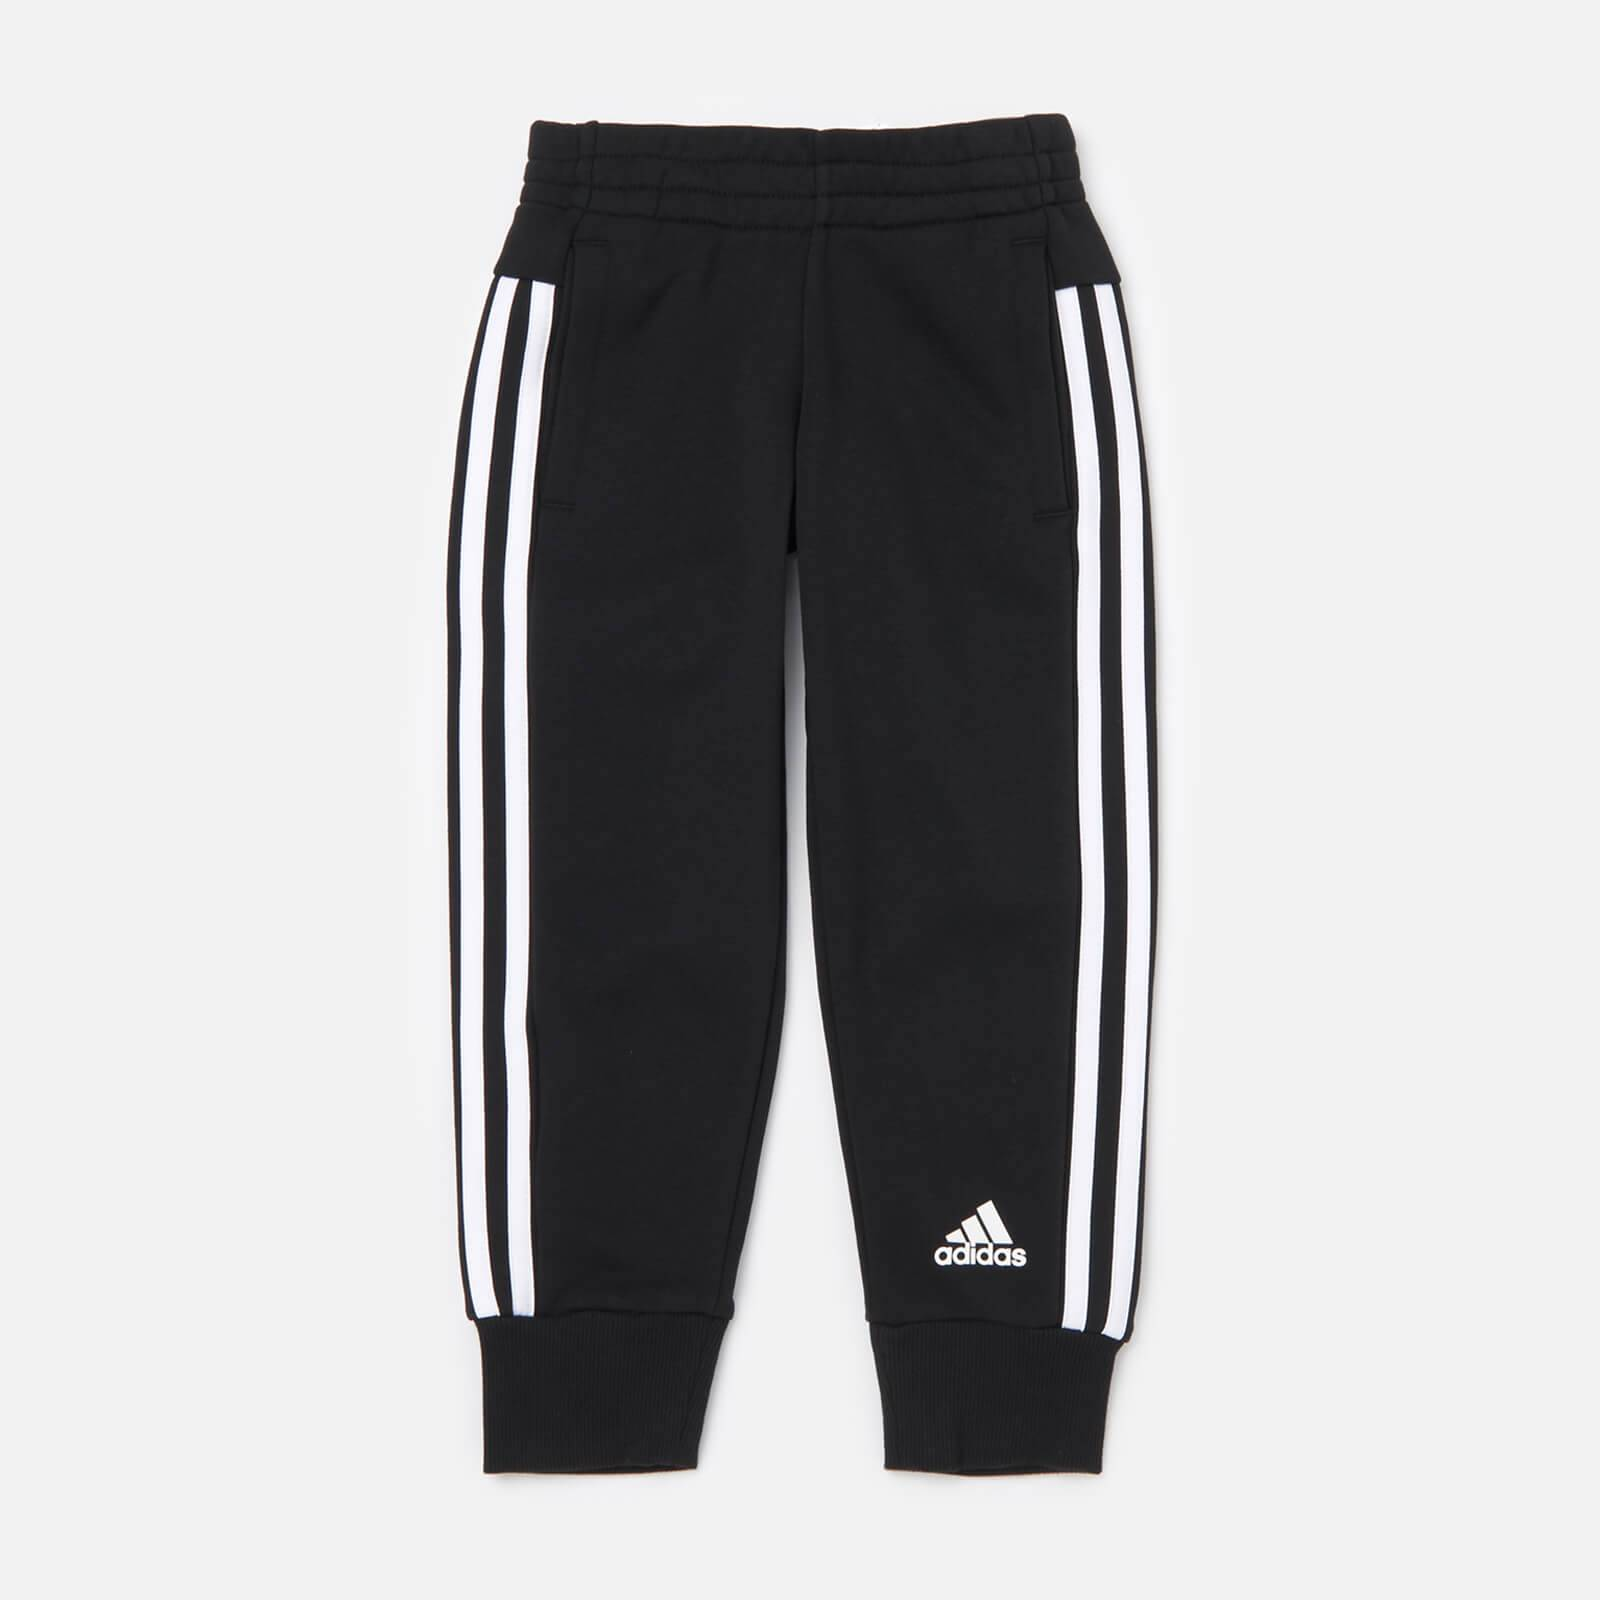 adidas Girls' Young Girls 3 Stripe Pants - Black - 5-6 Years